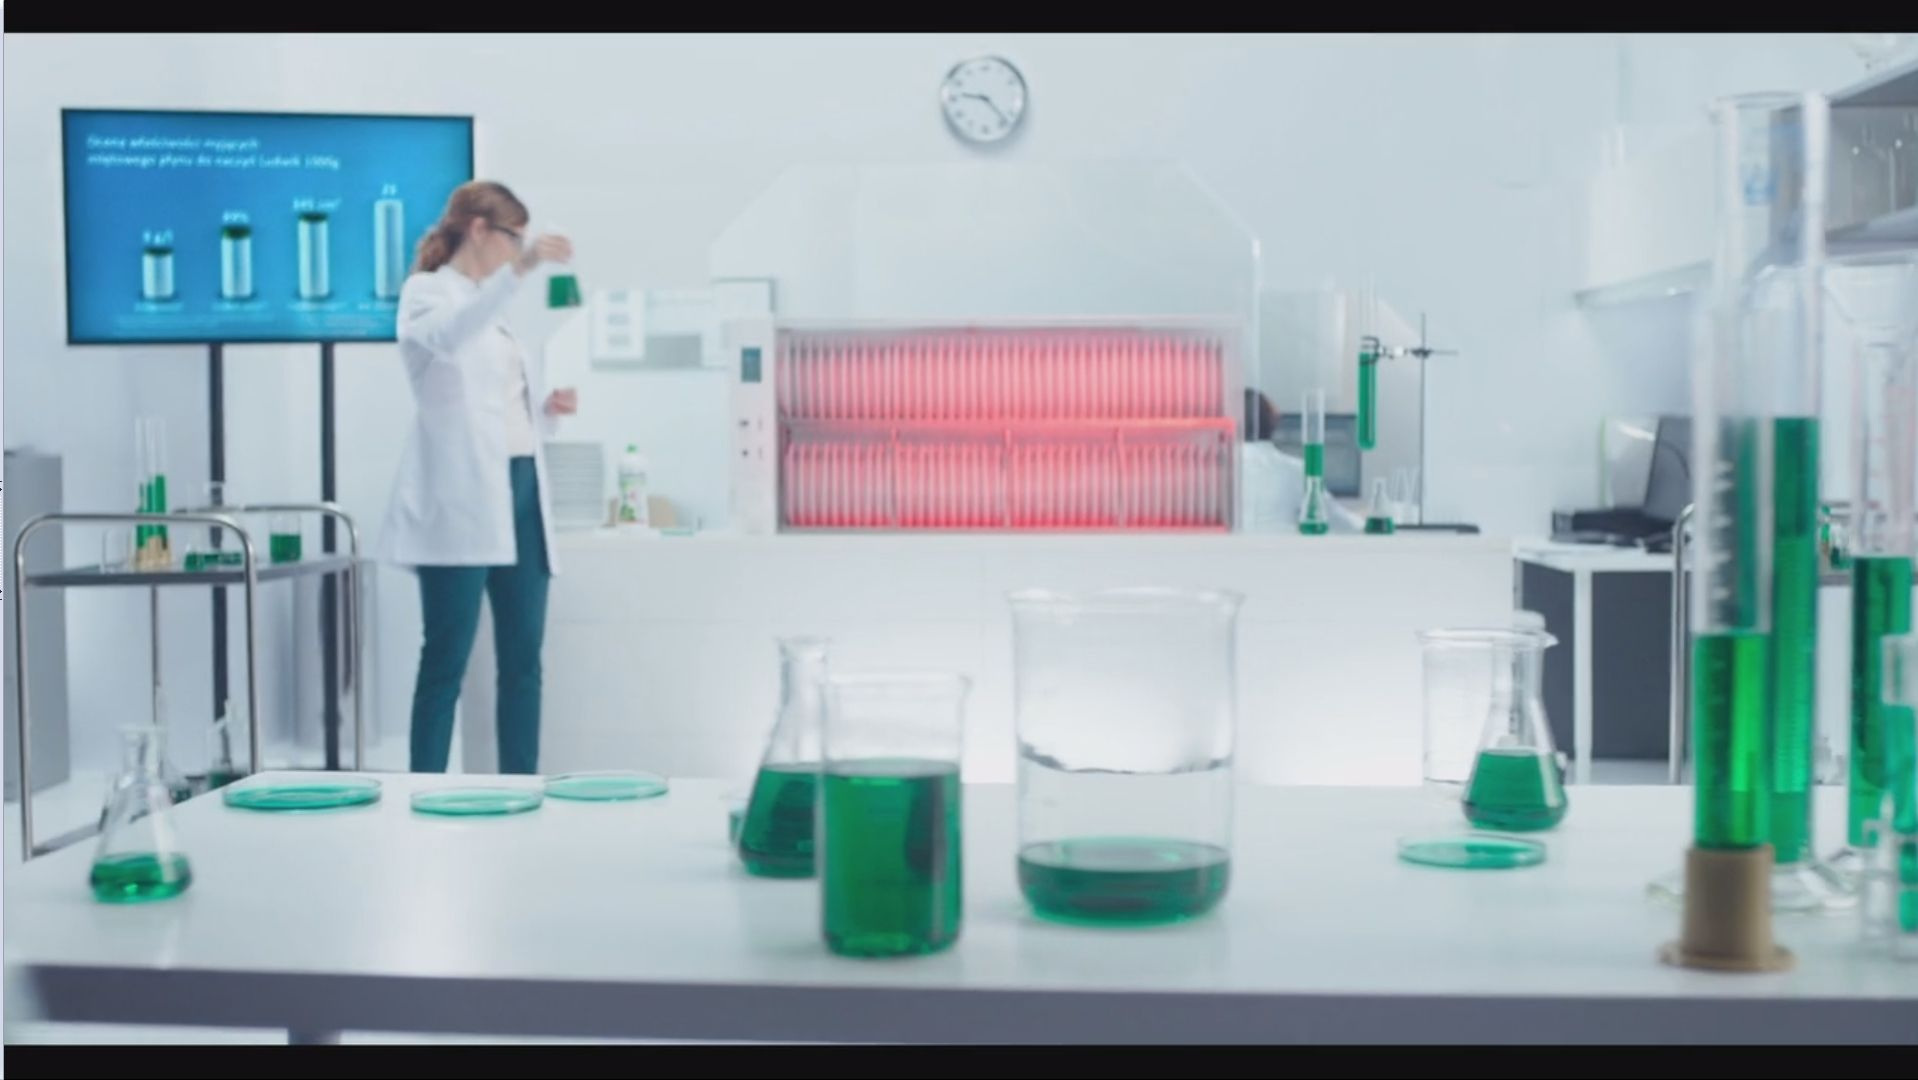 LUDWIK - Laboratorium